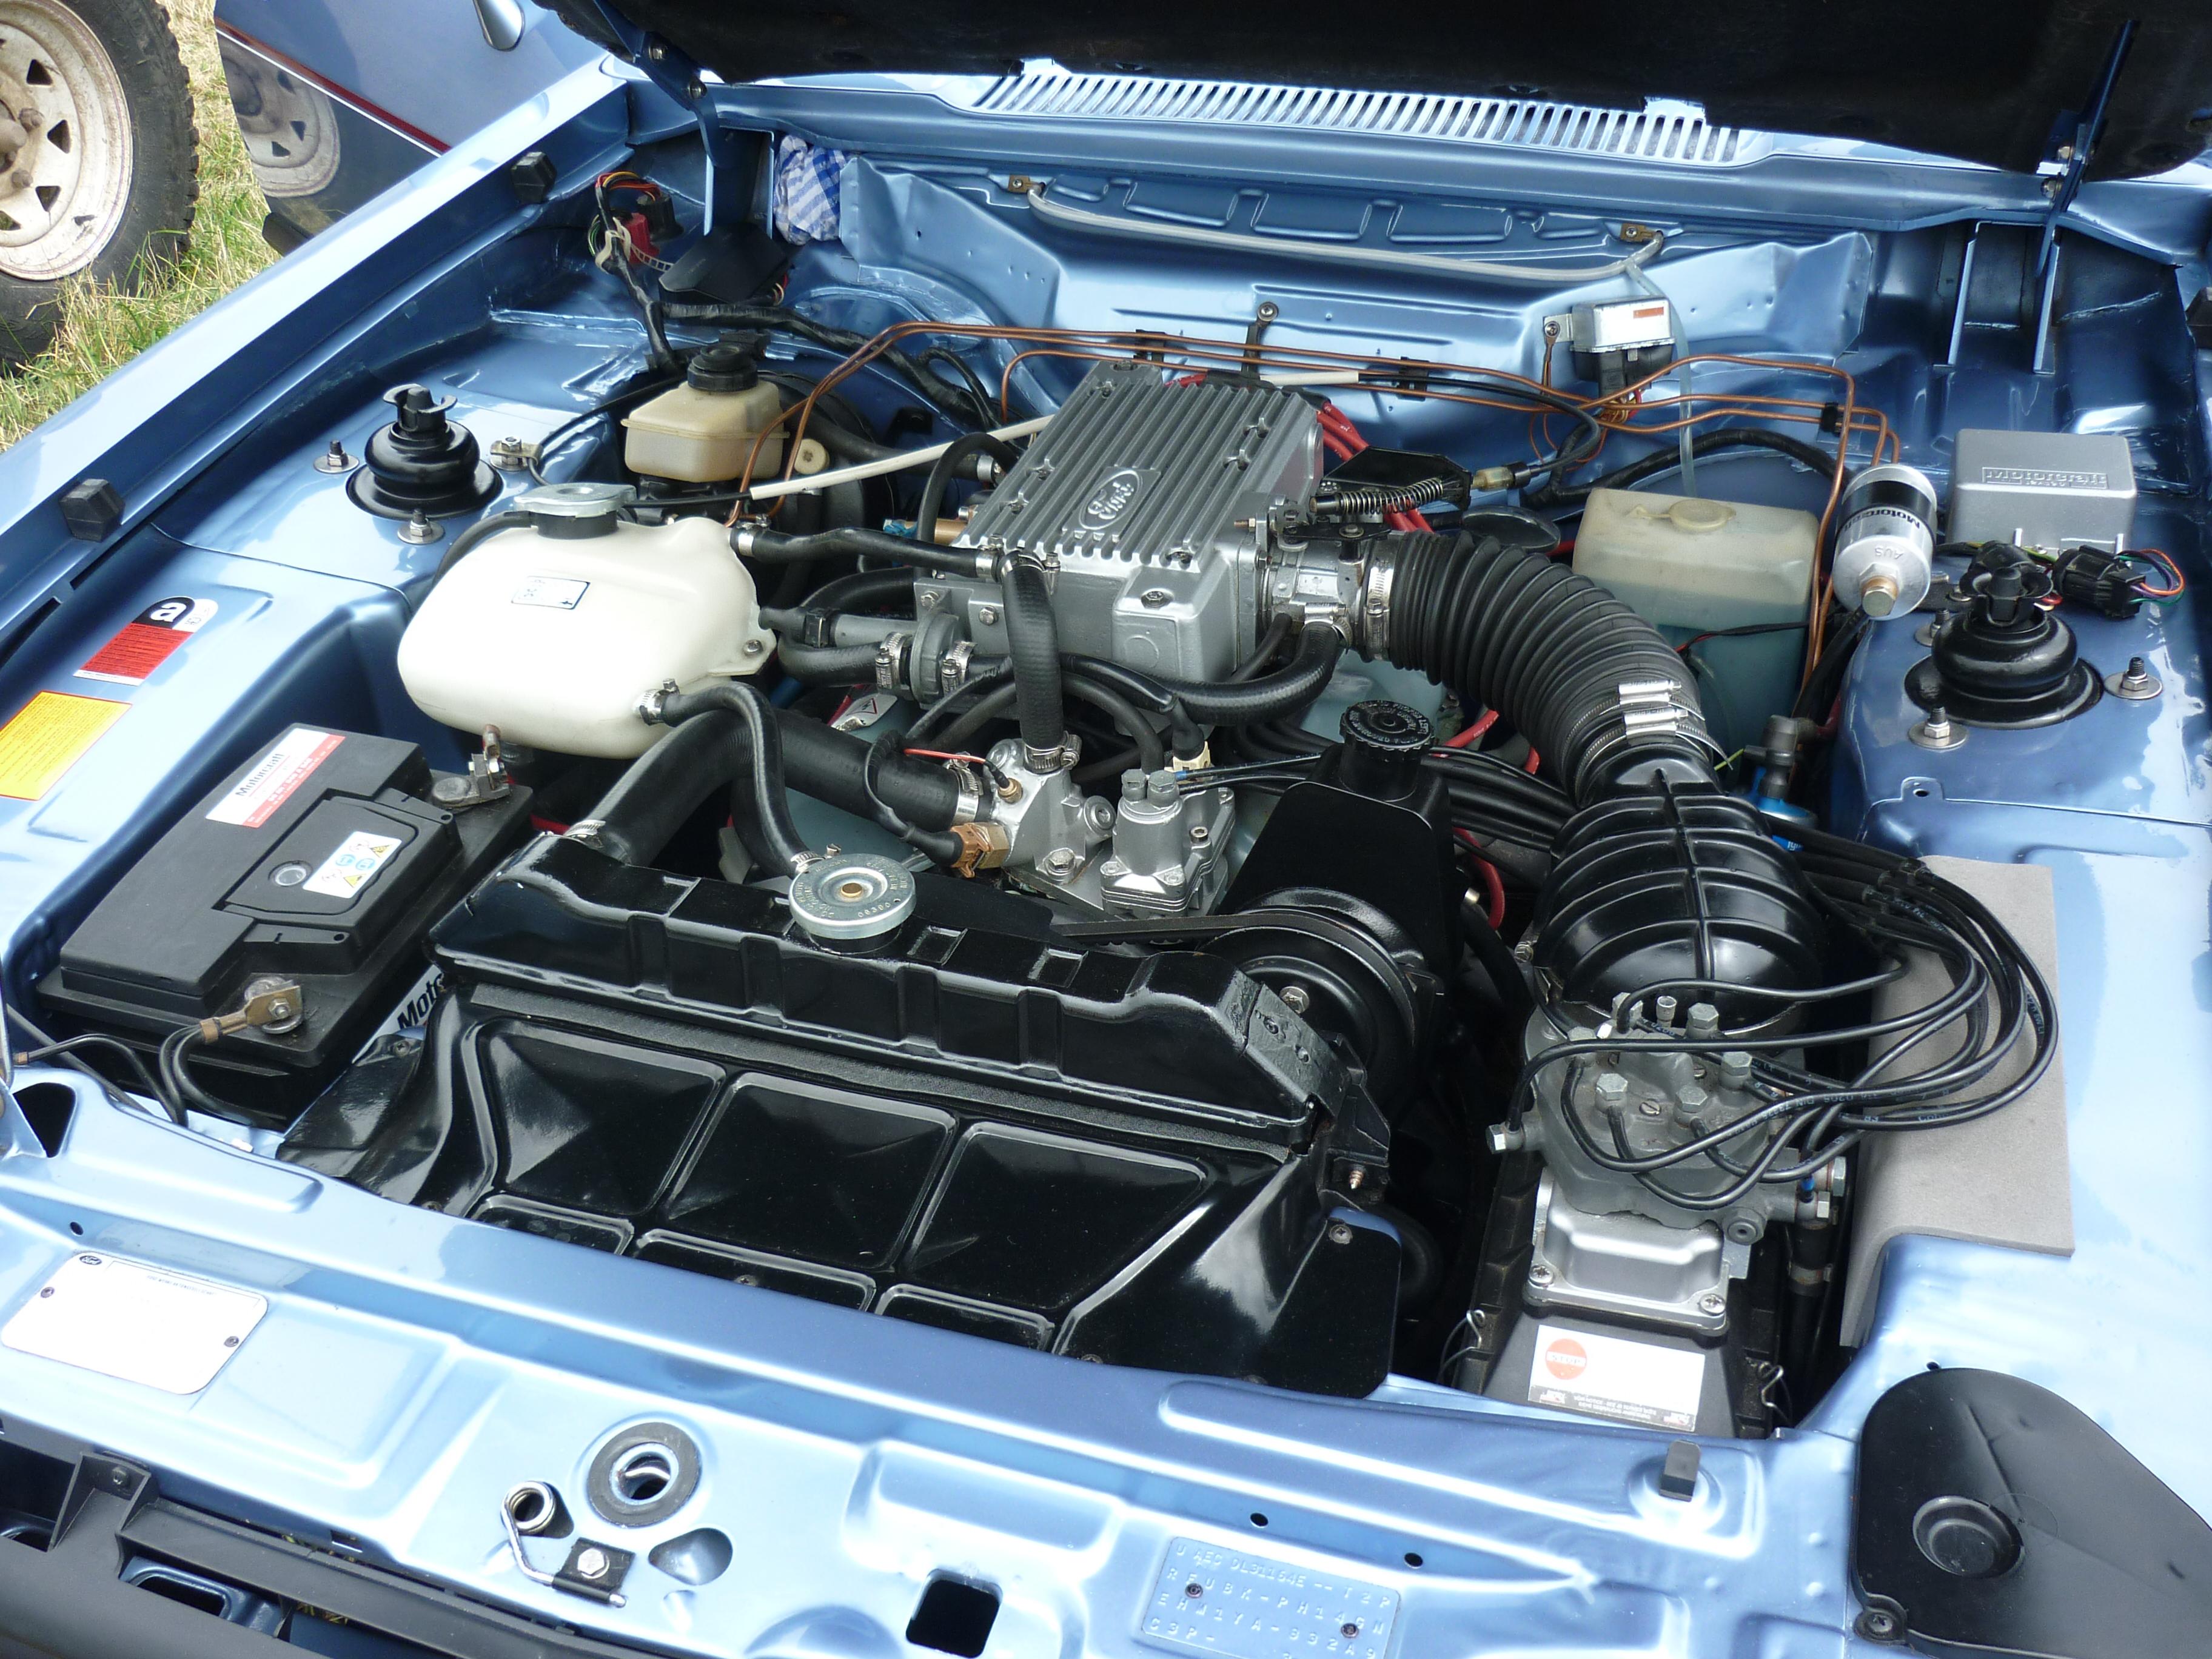 Ford Capri 2.8i Engine Bay